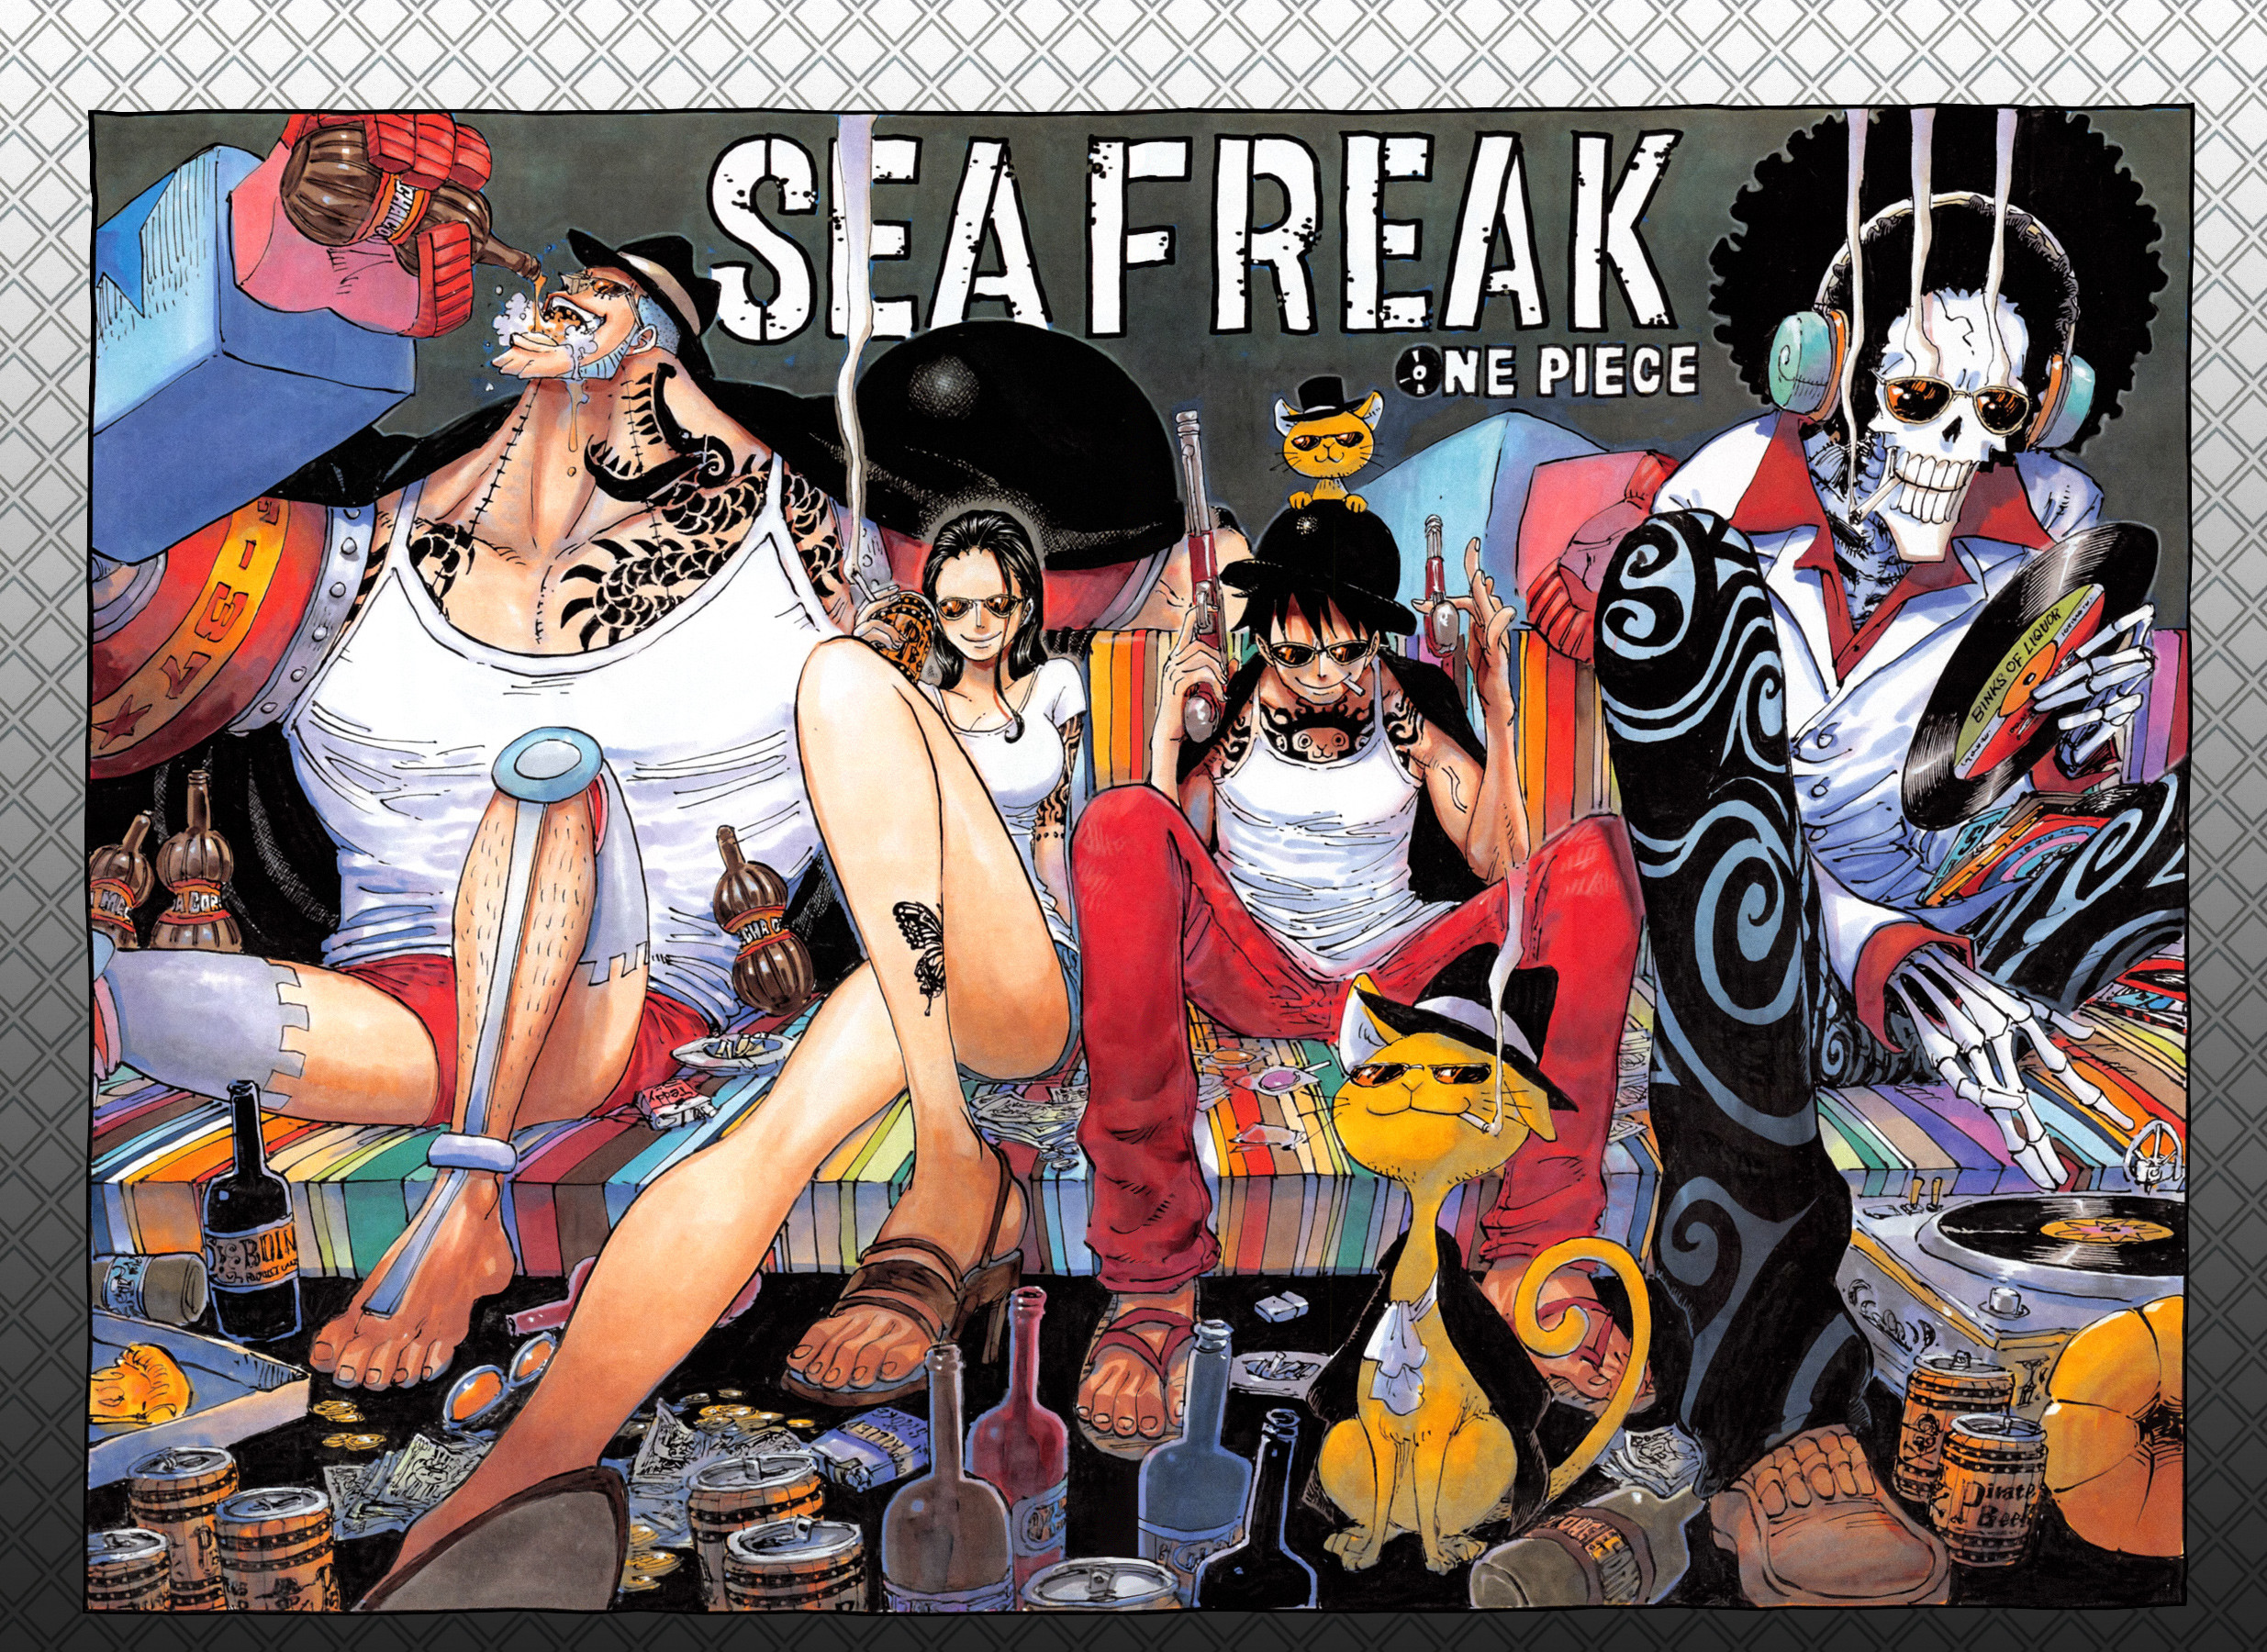 Res: 2470x1800, One Piece Zoro Wallpapers Wallpaper